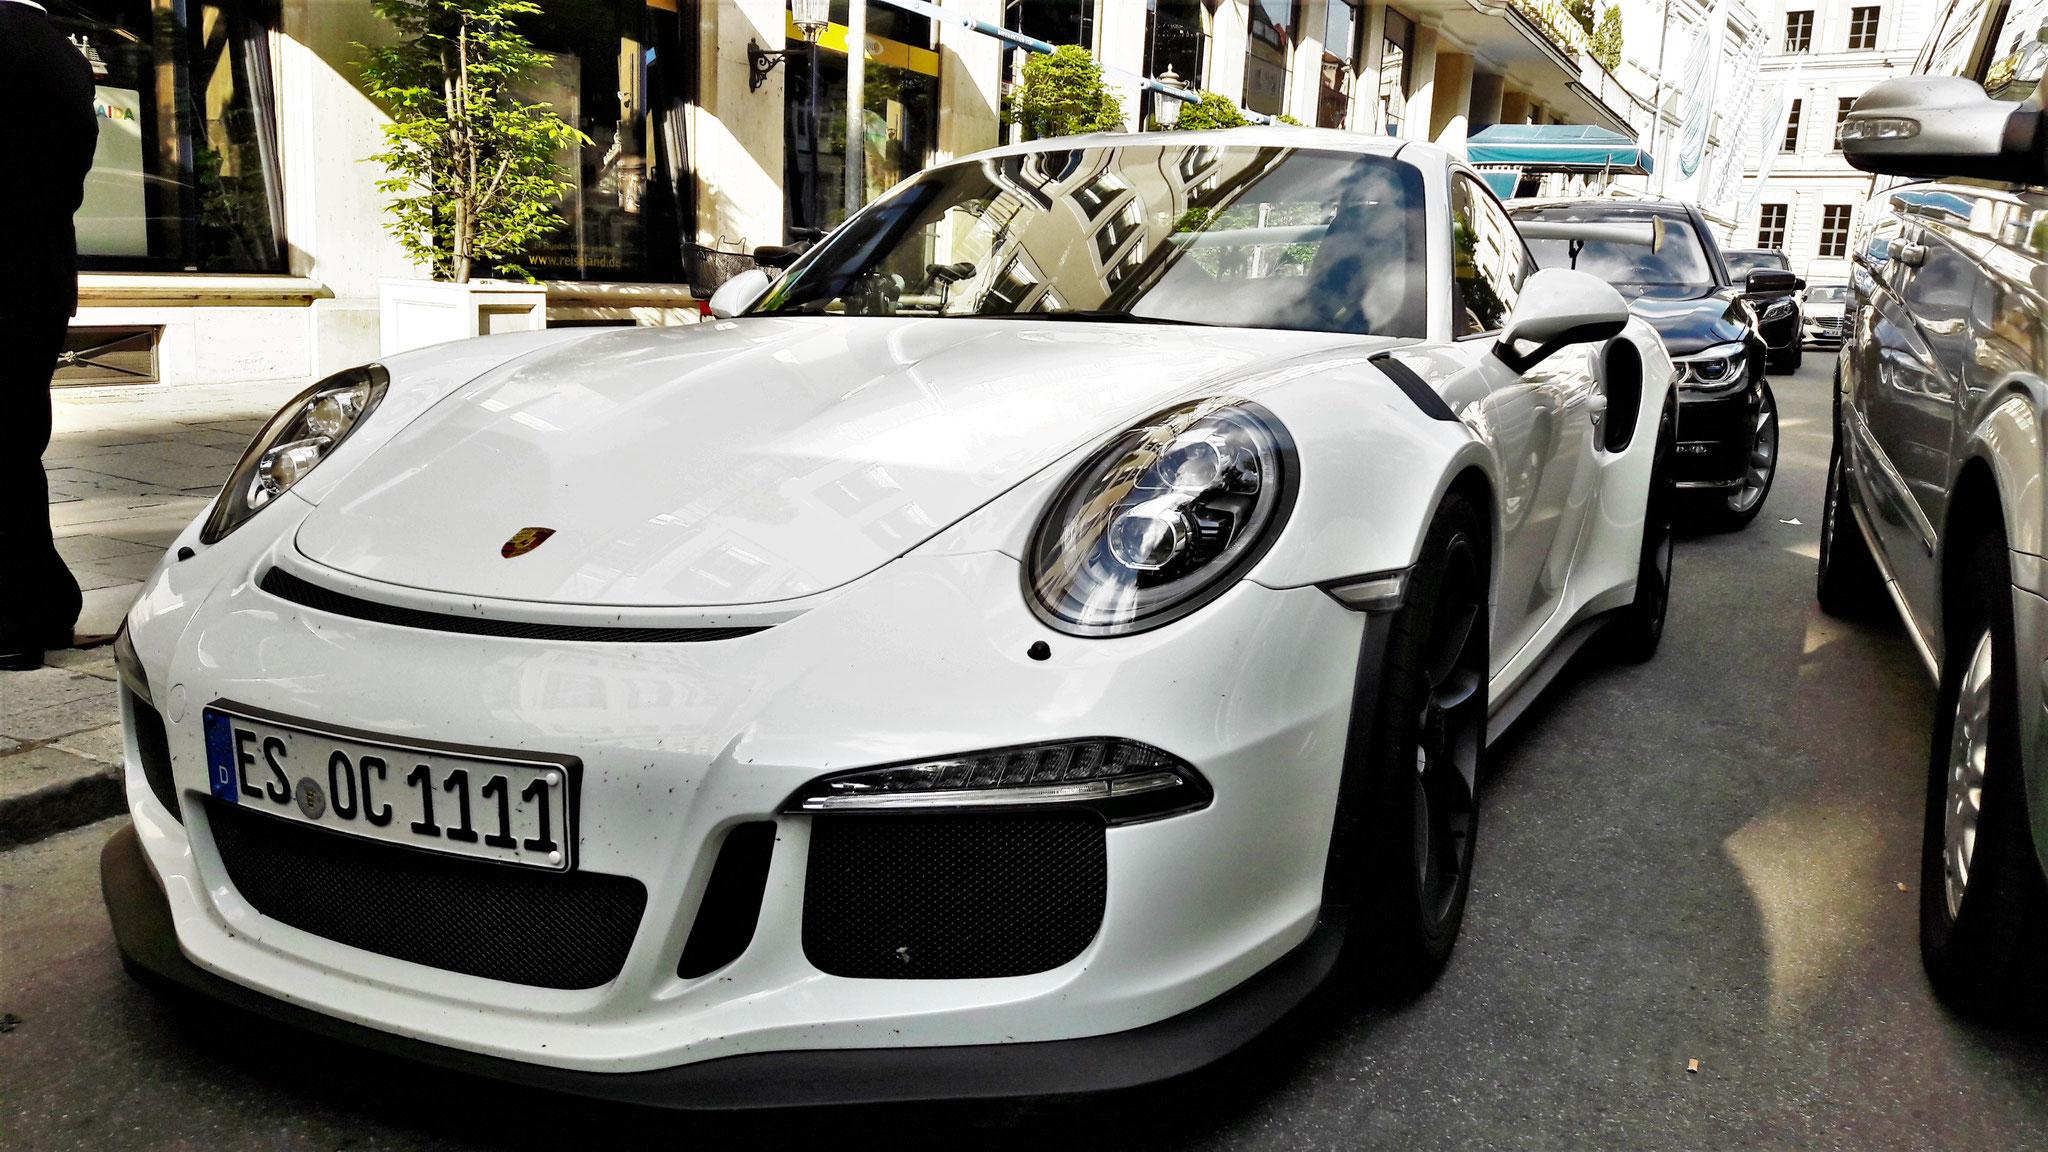 Porsche 911 GT3 RS - ES-OC-1111